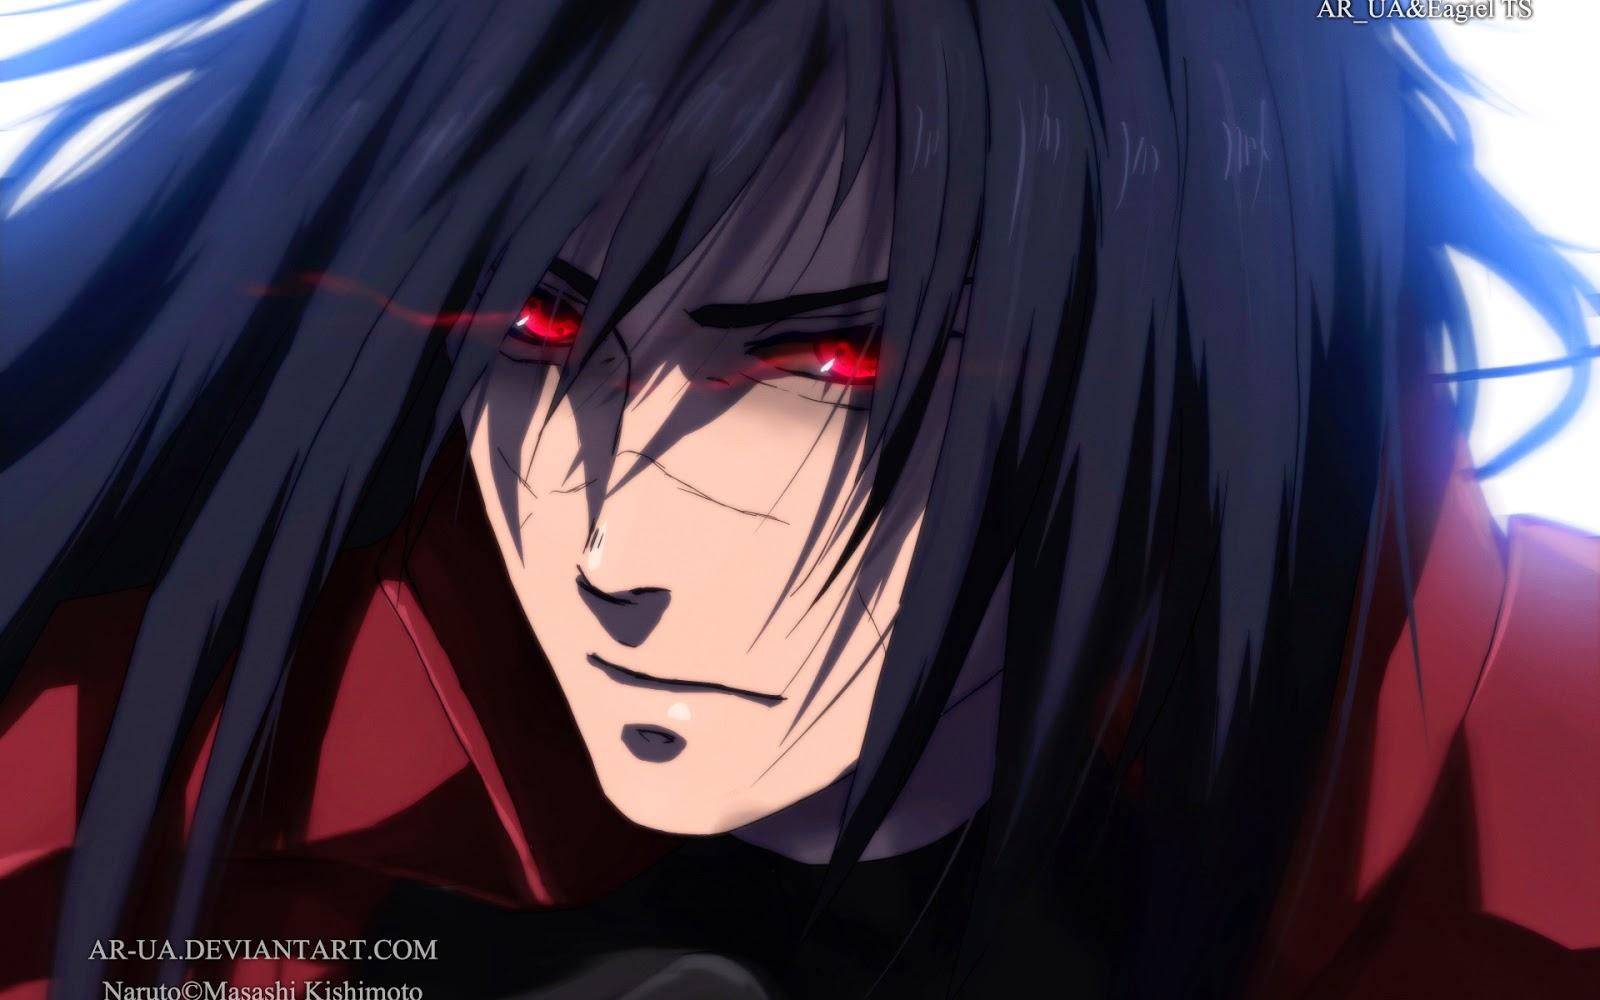 Uchiha Madara Sharingan Eyes Anime Wallpaper HD f09 Male 1600x1000